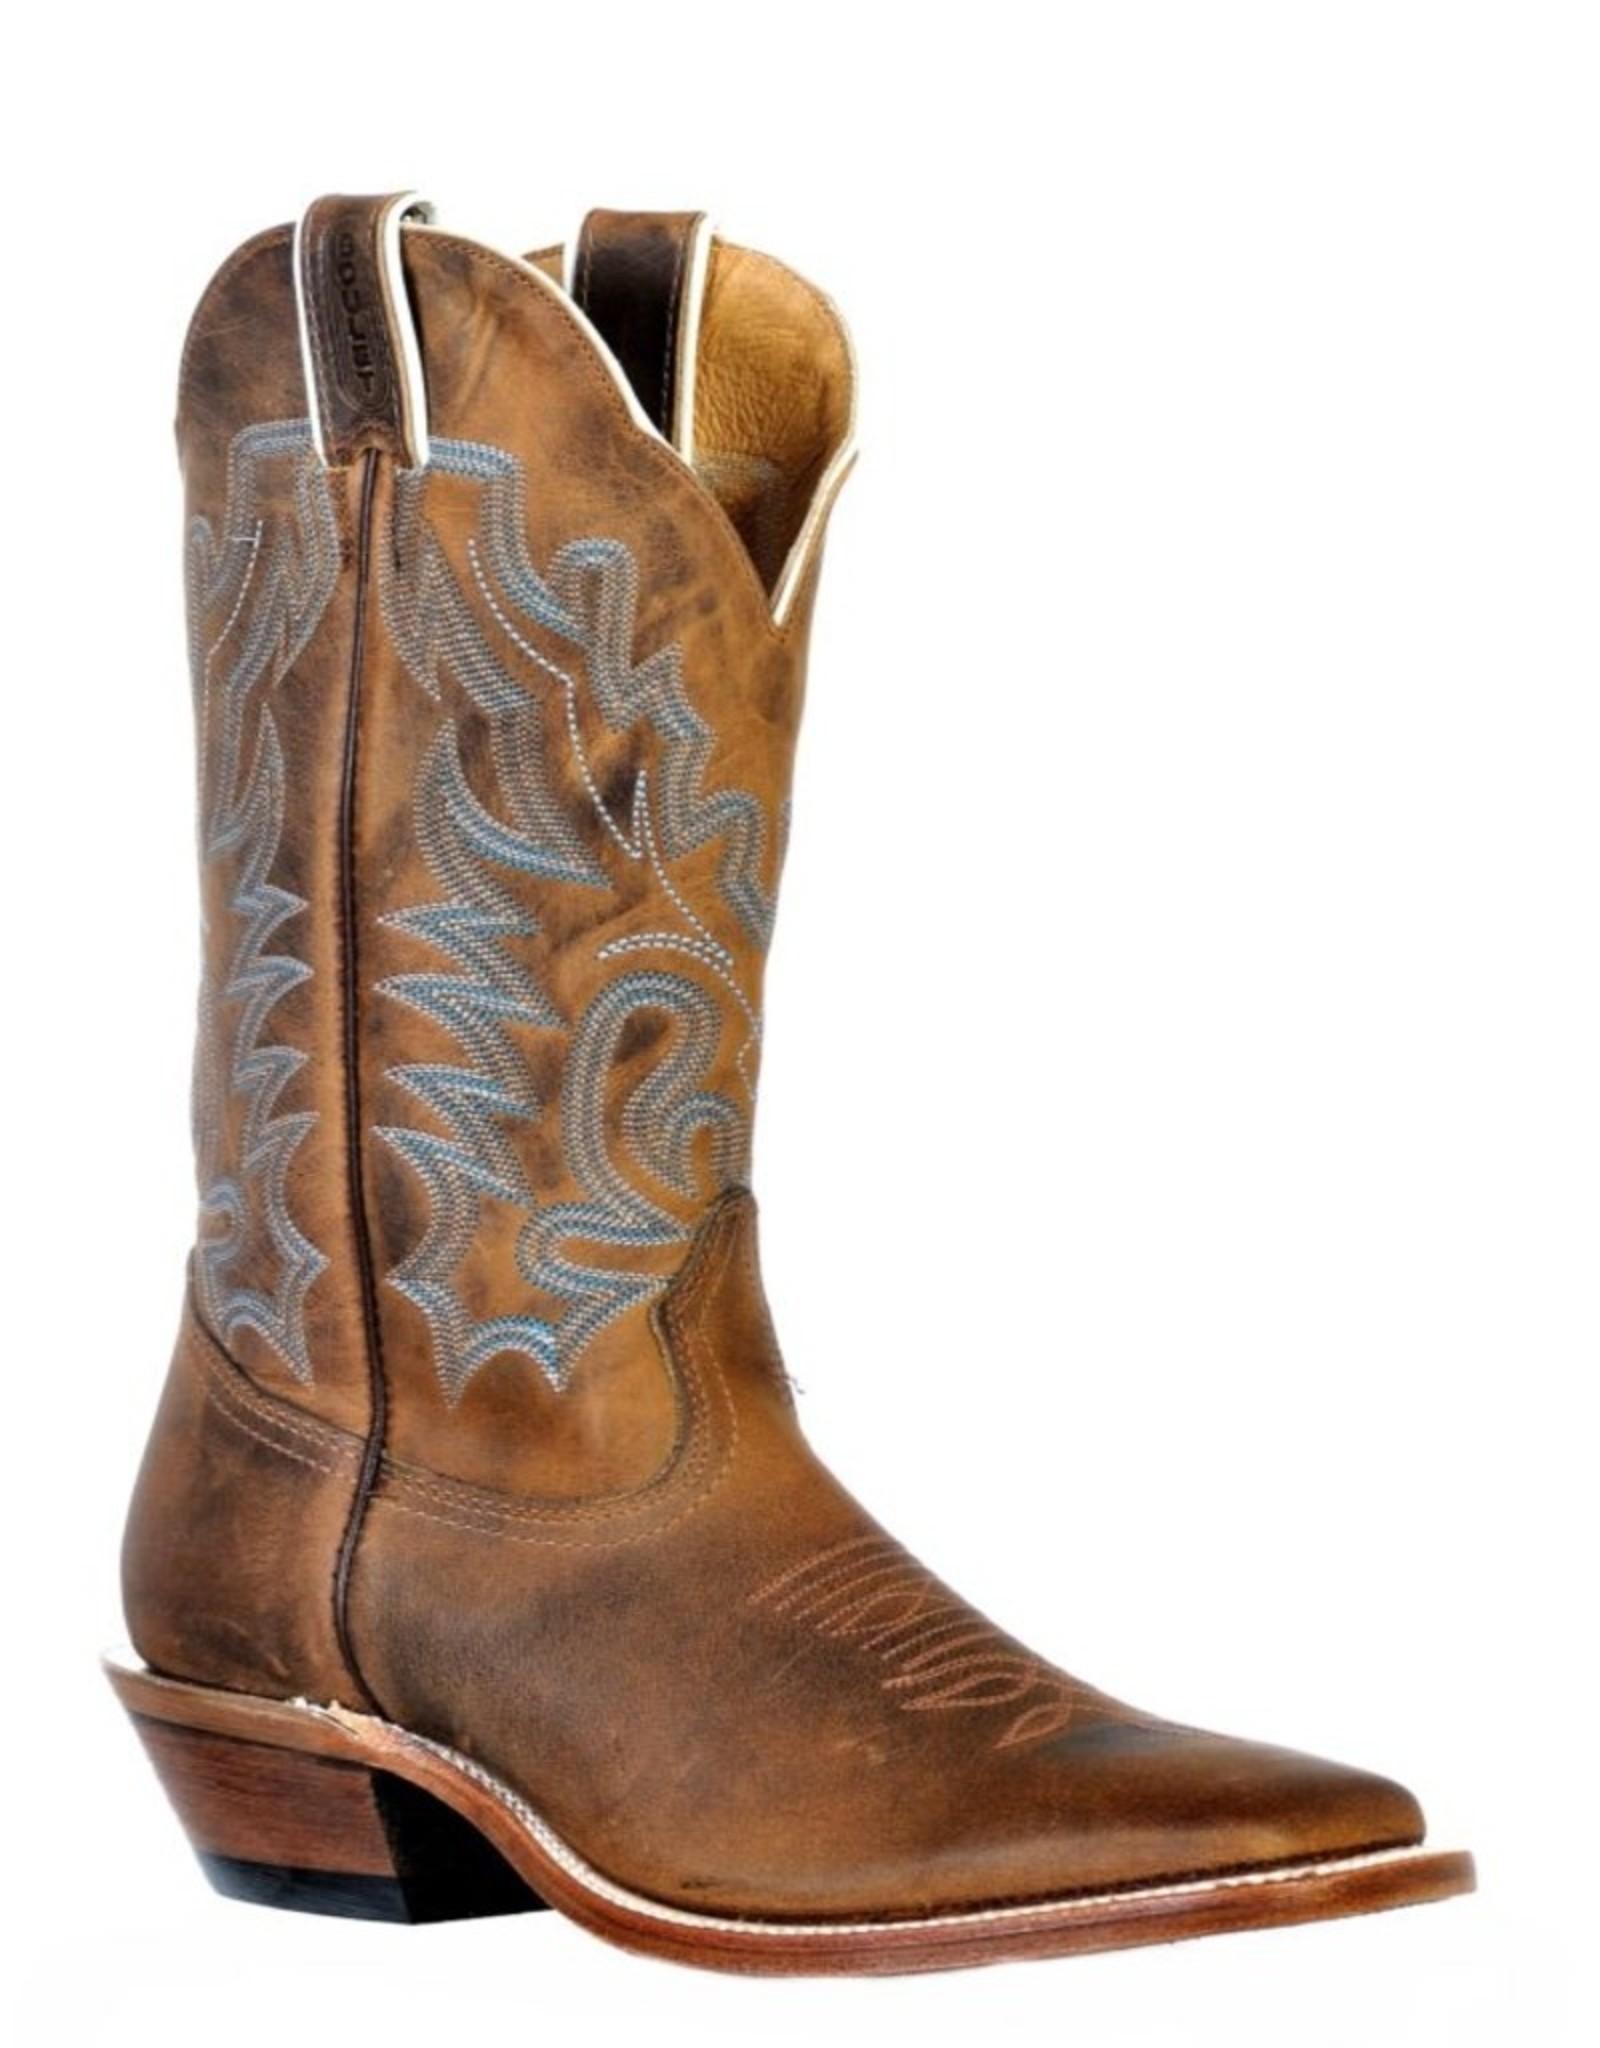 Boulet Boulet Square Toe Leather Boots